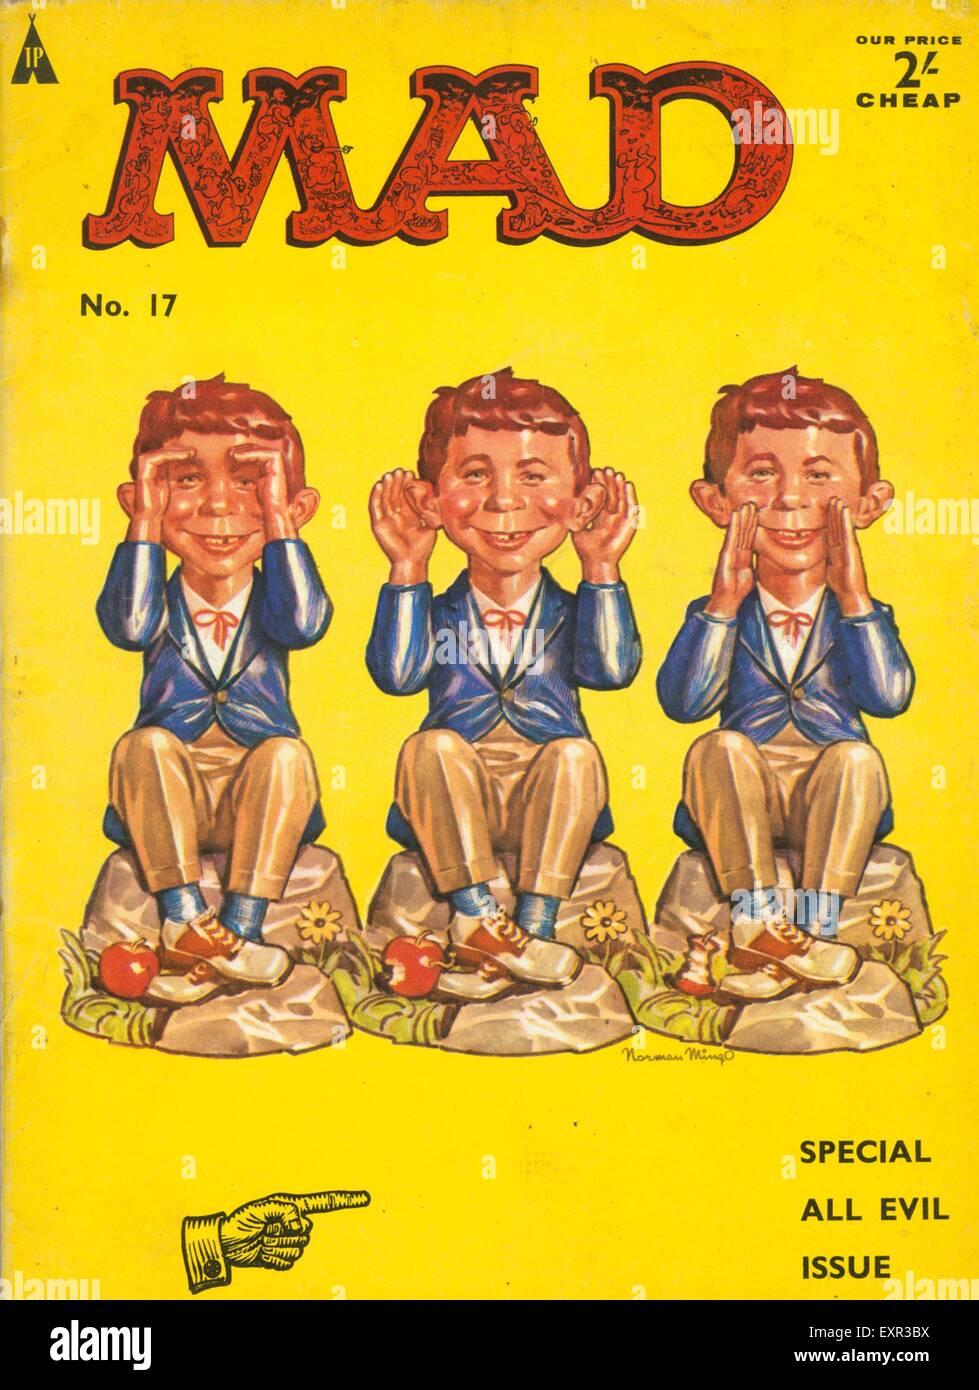 1960s uk mad magazine cover stock photo 85330110 alamy